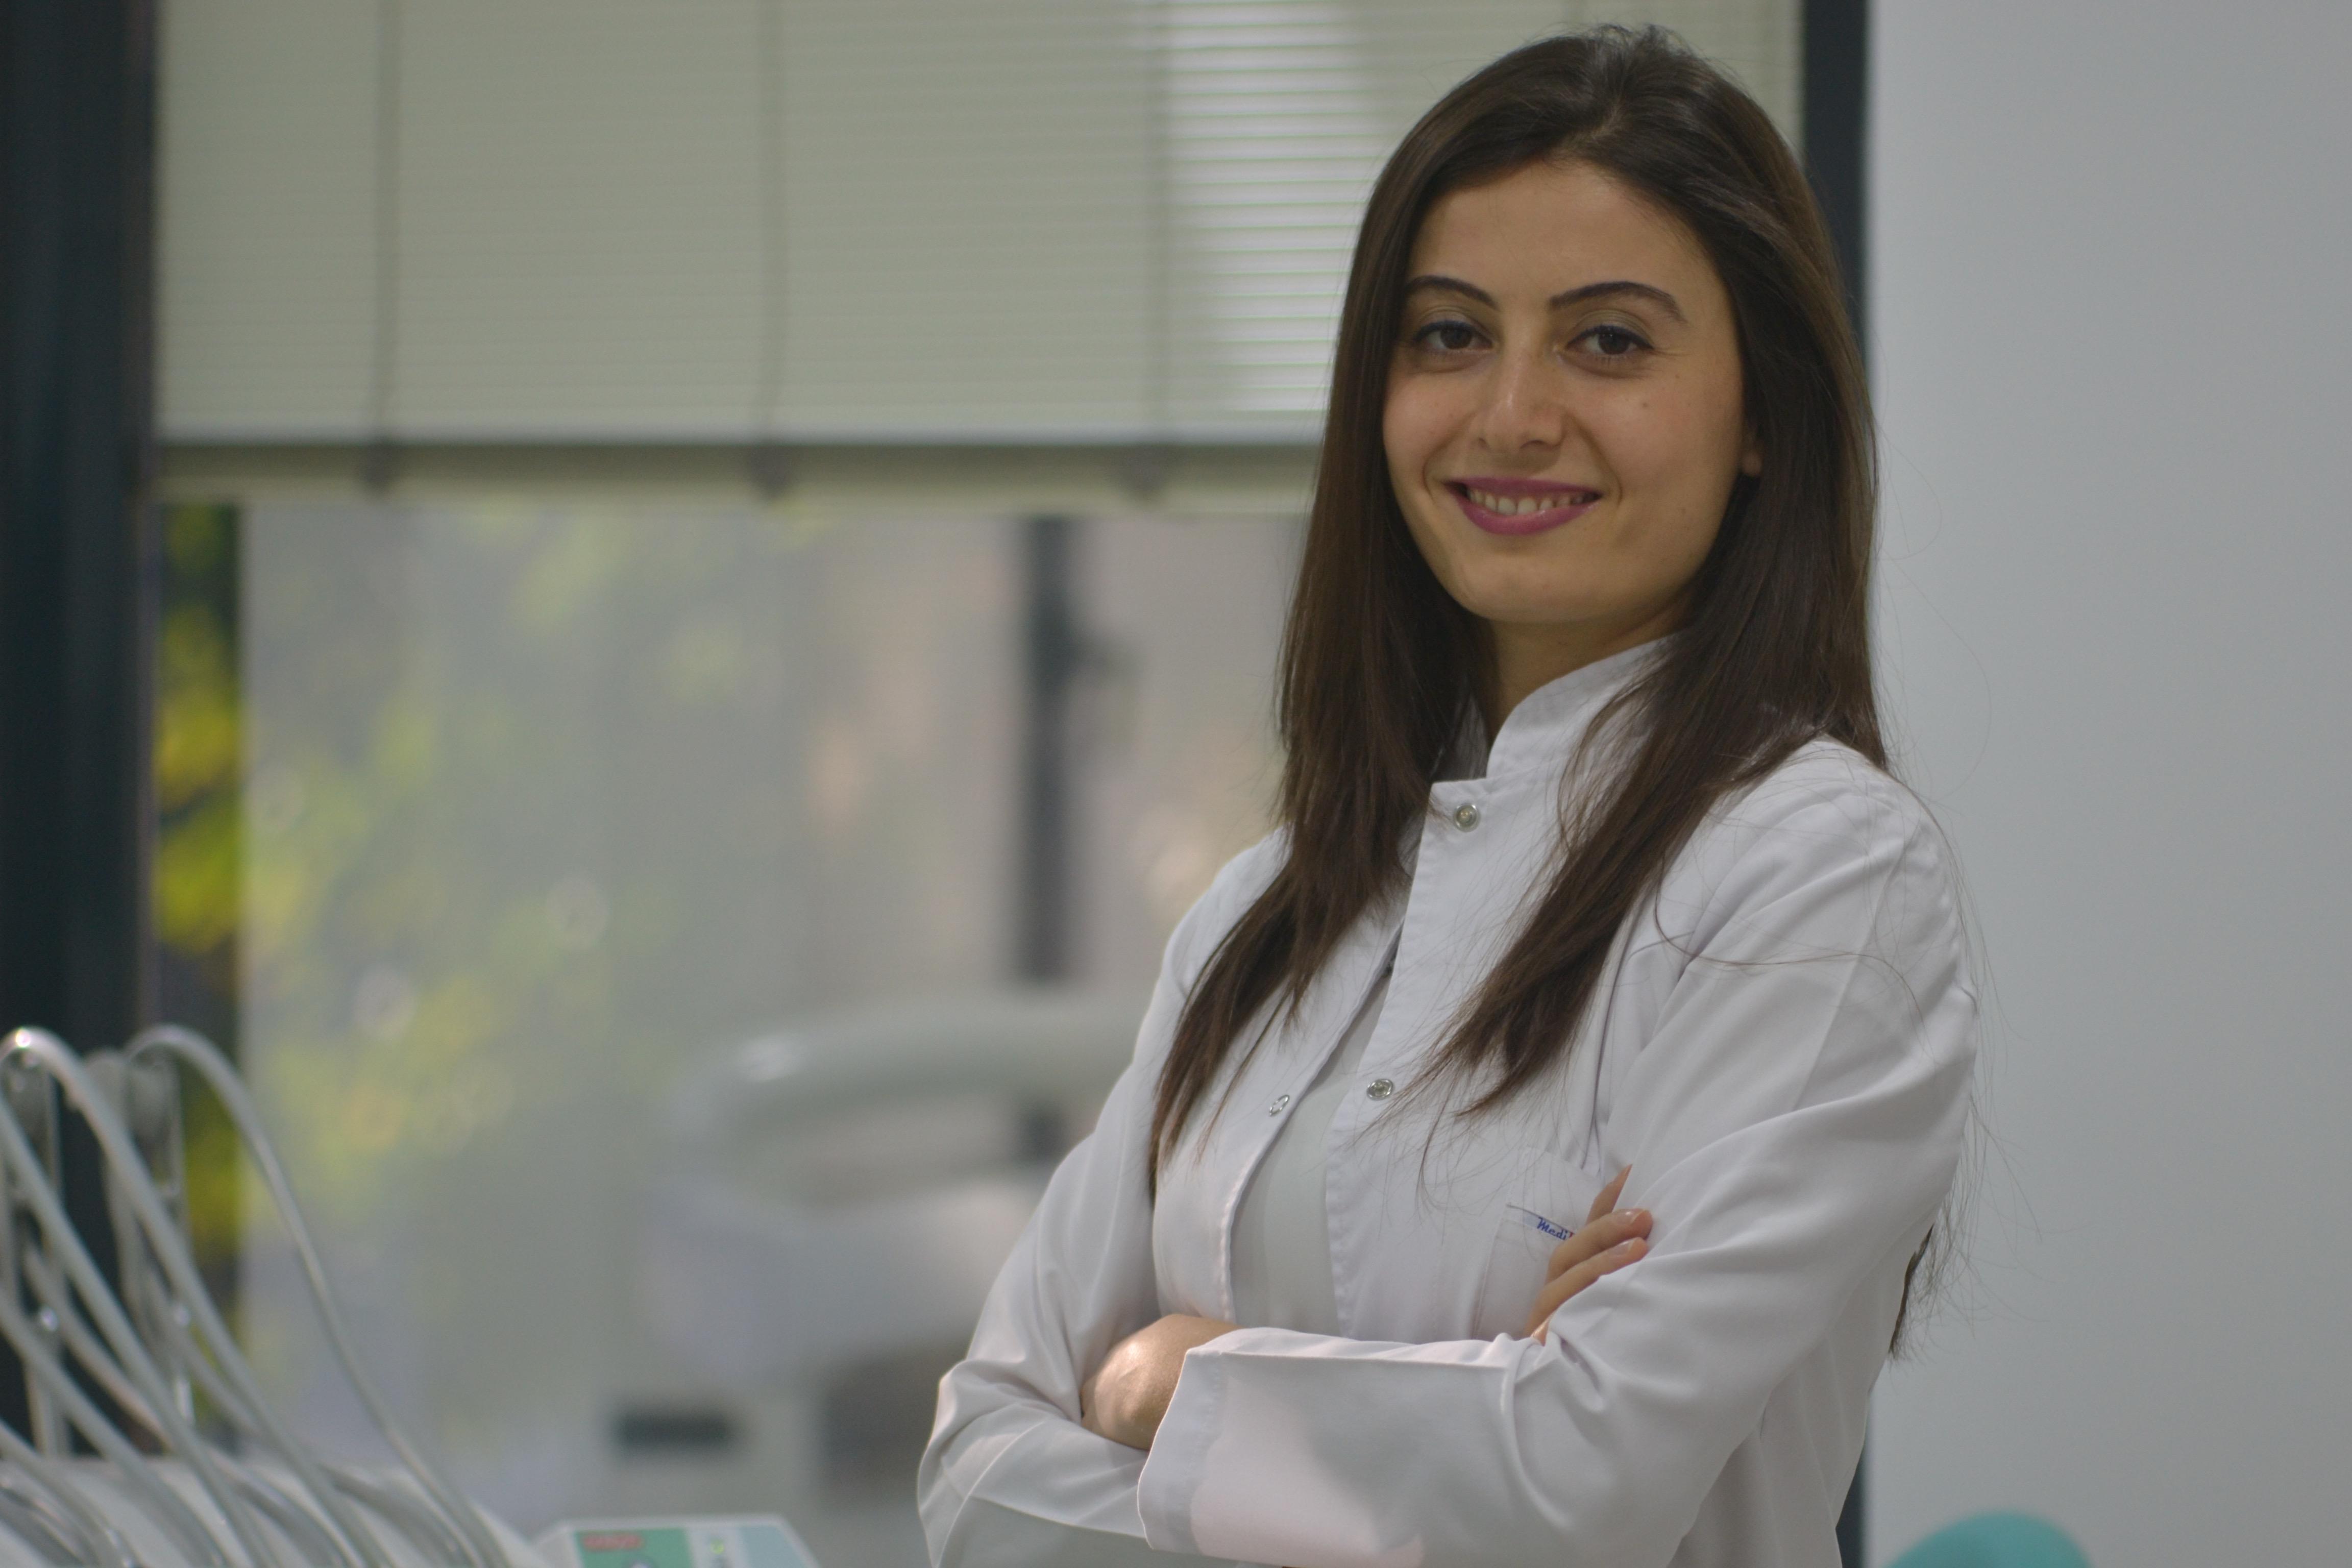 Dr. Bengu Turk